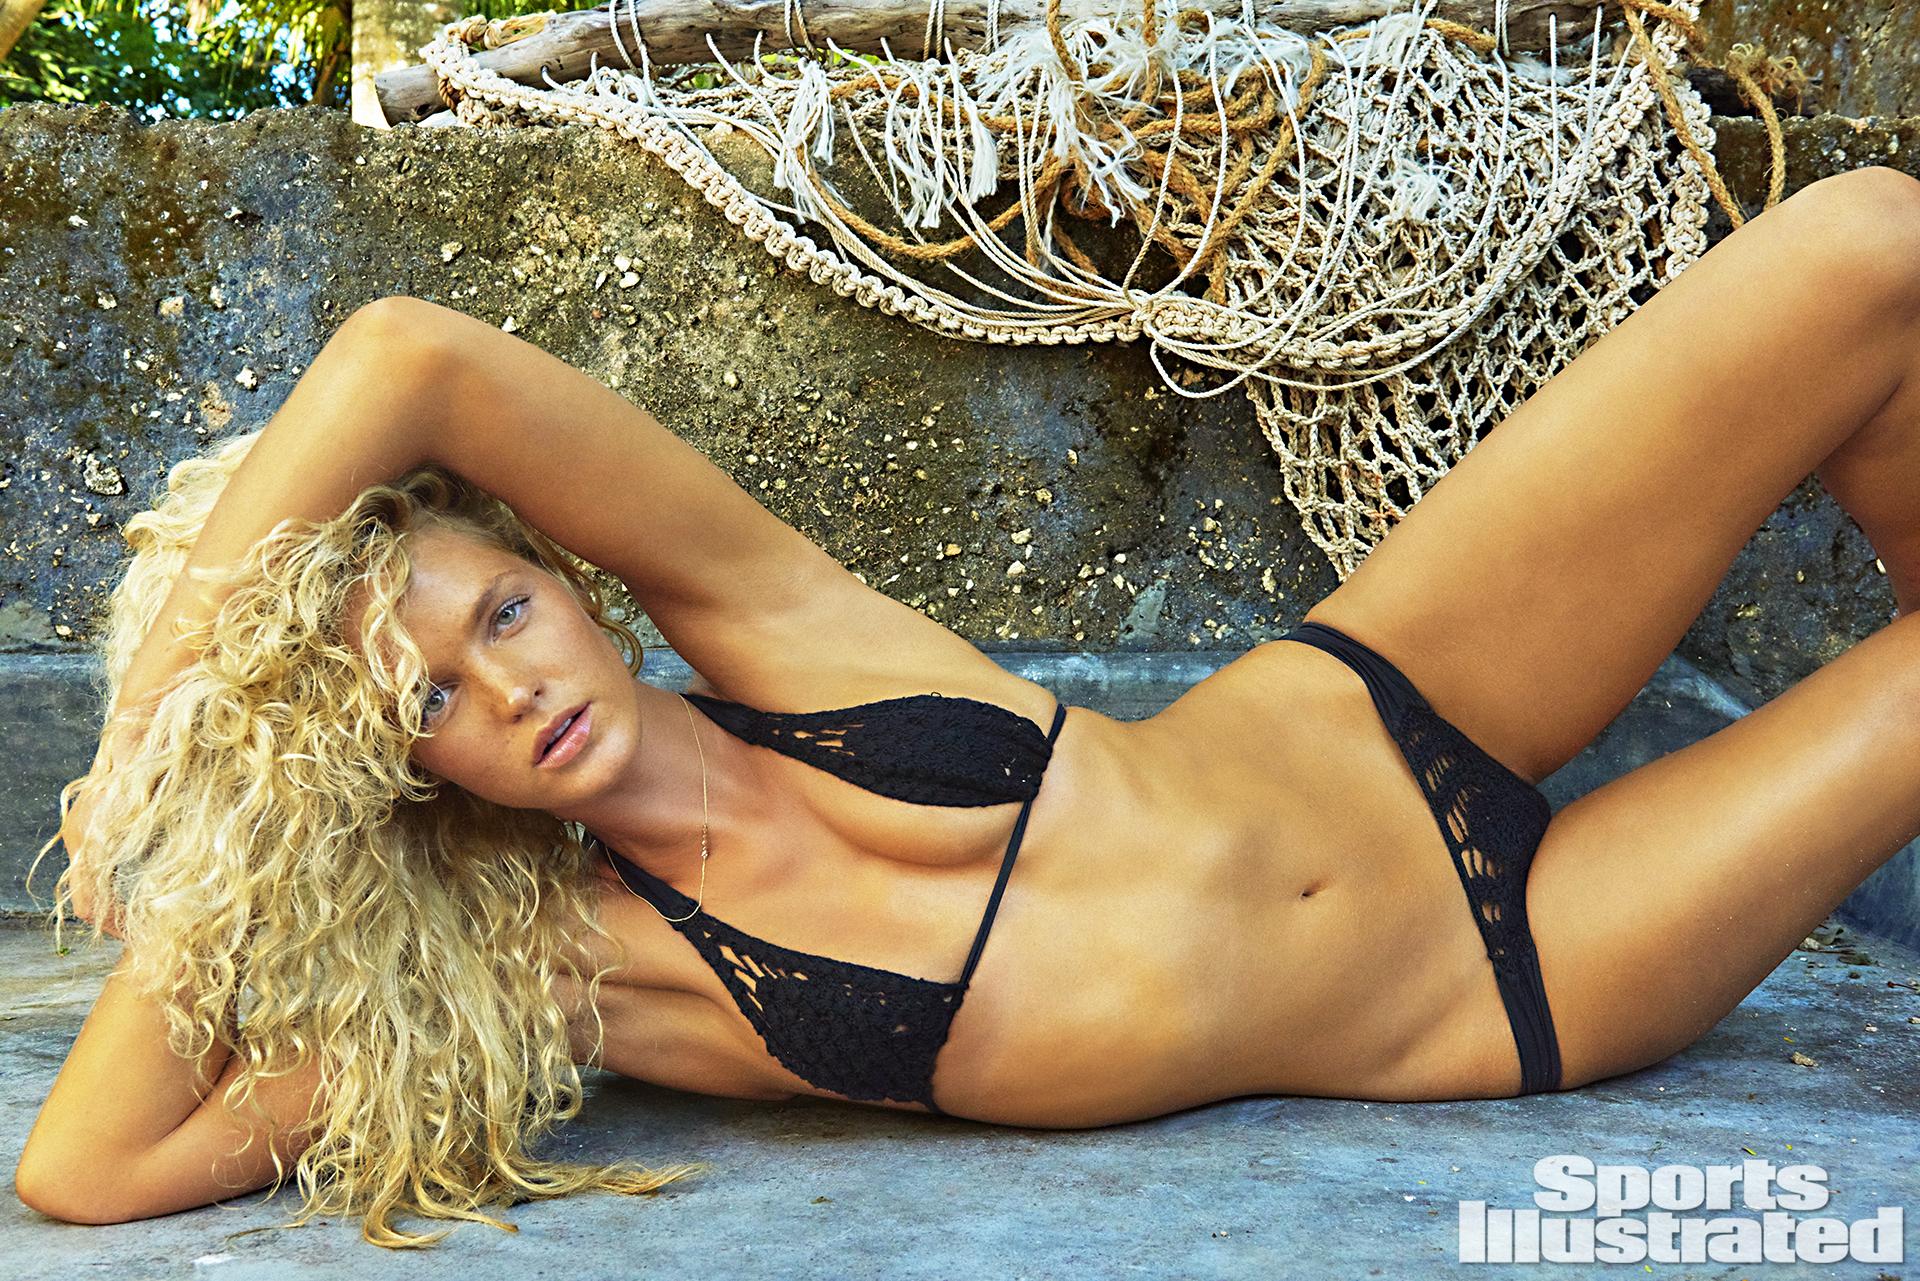 Erin Heatherton was photographed by Ruven Afanador in Zanzibar. Swimsuit by INDAH.